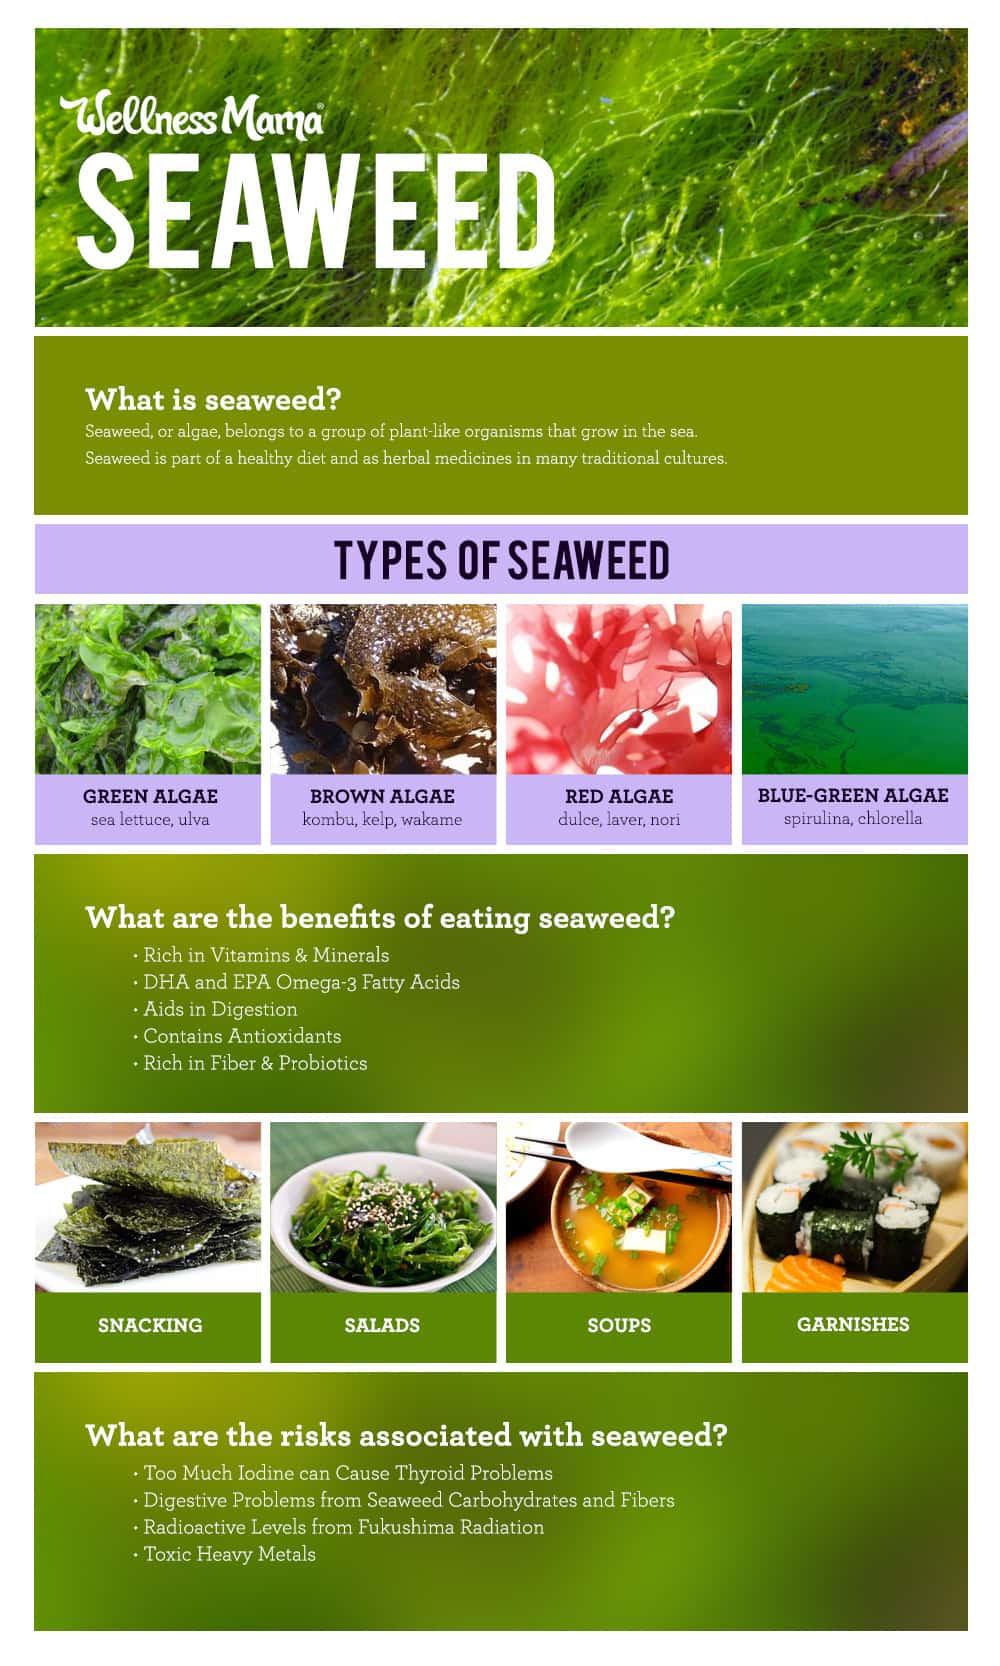 WM-Seaweed-InfoGraph